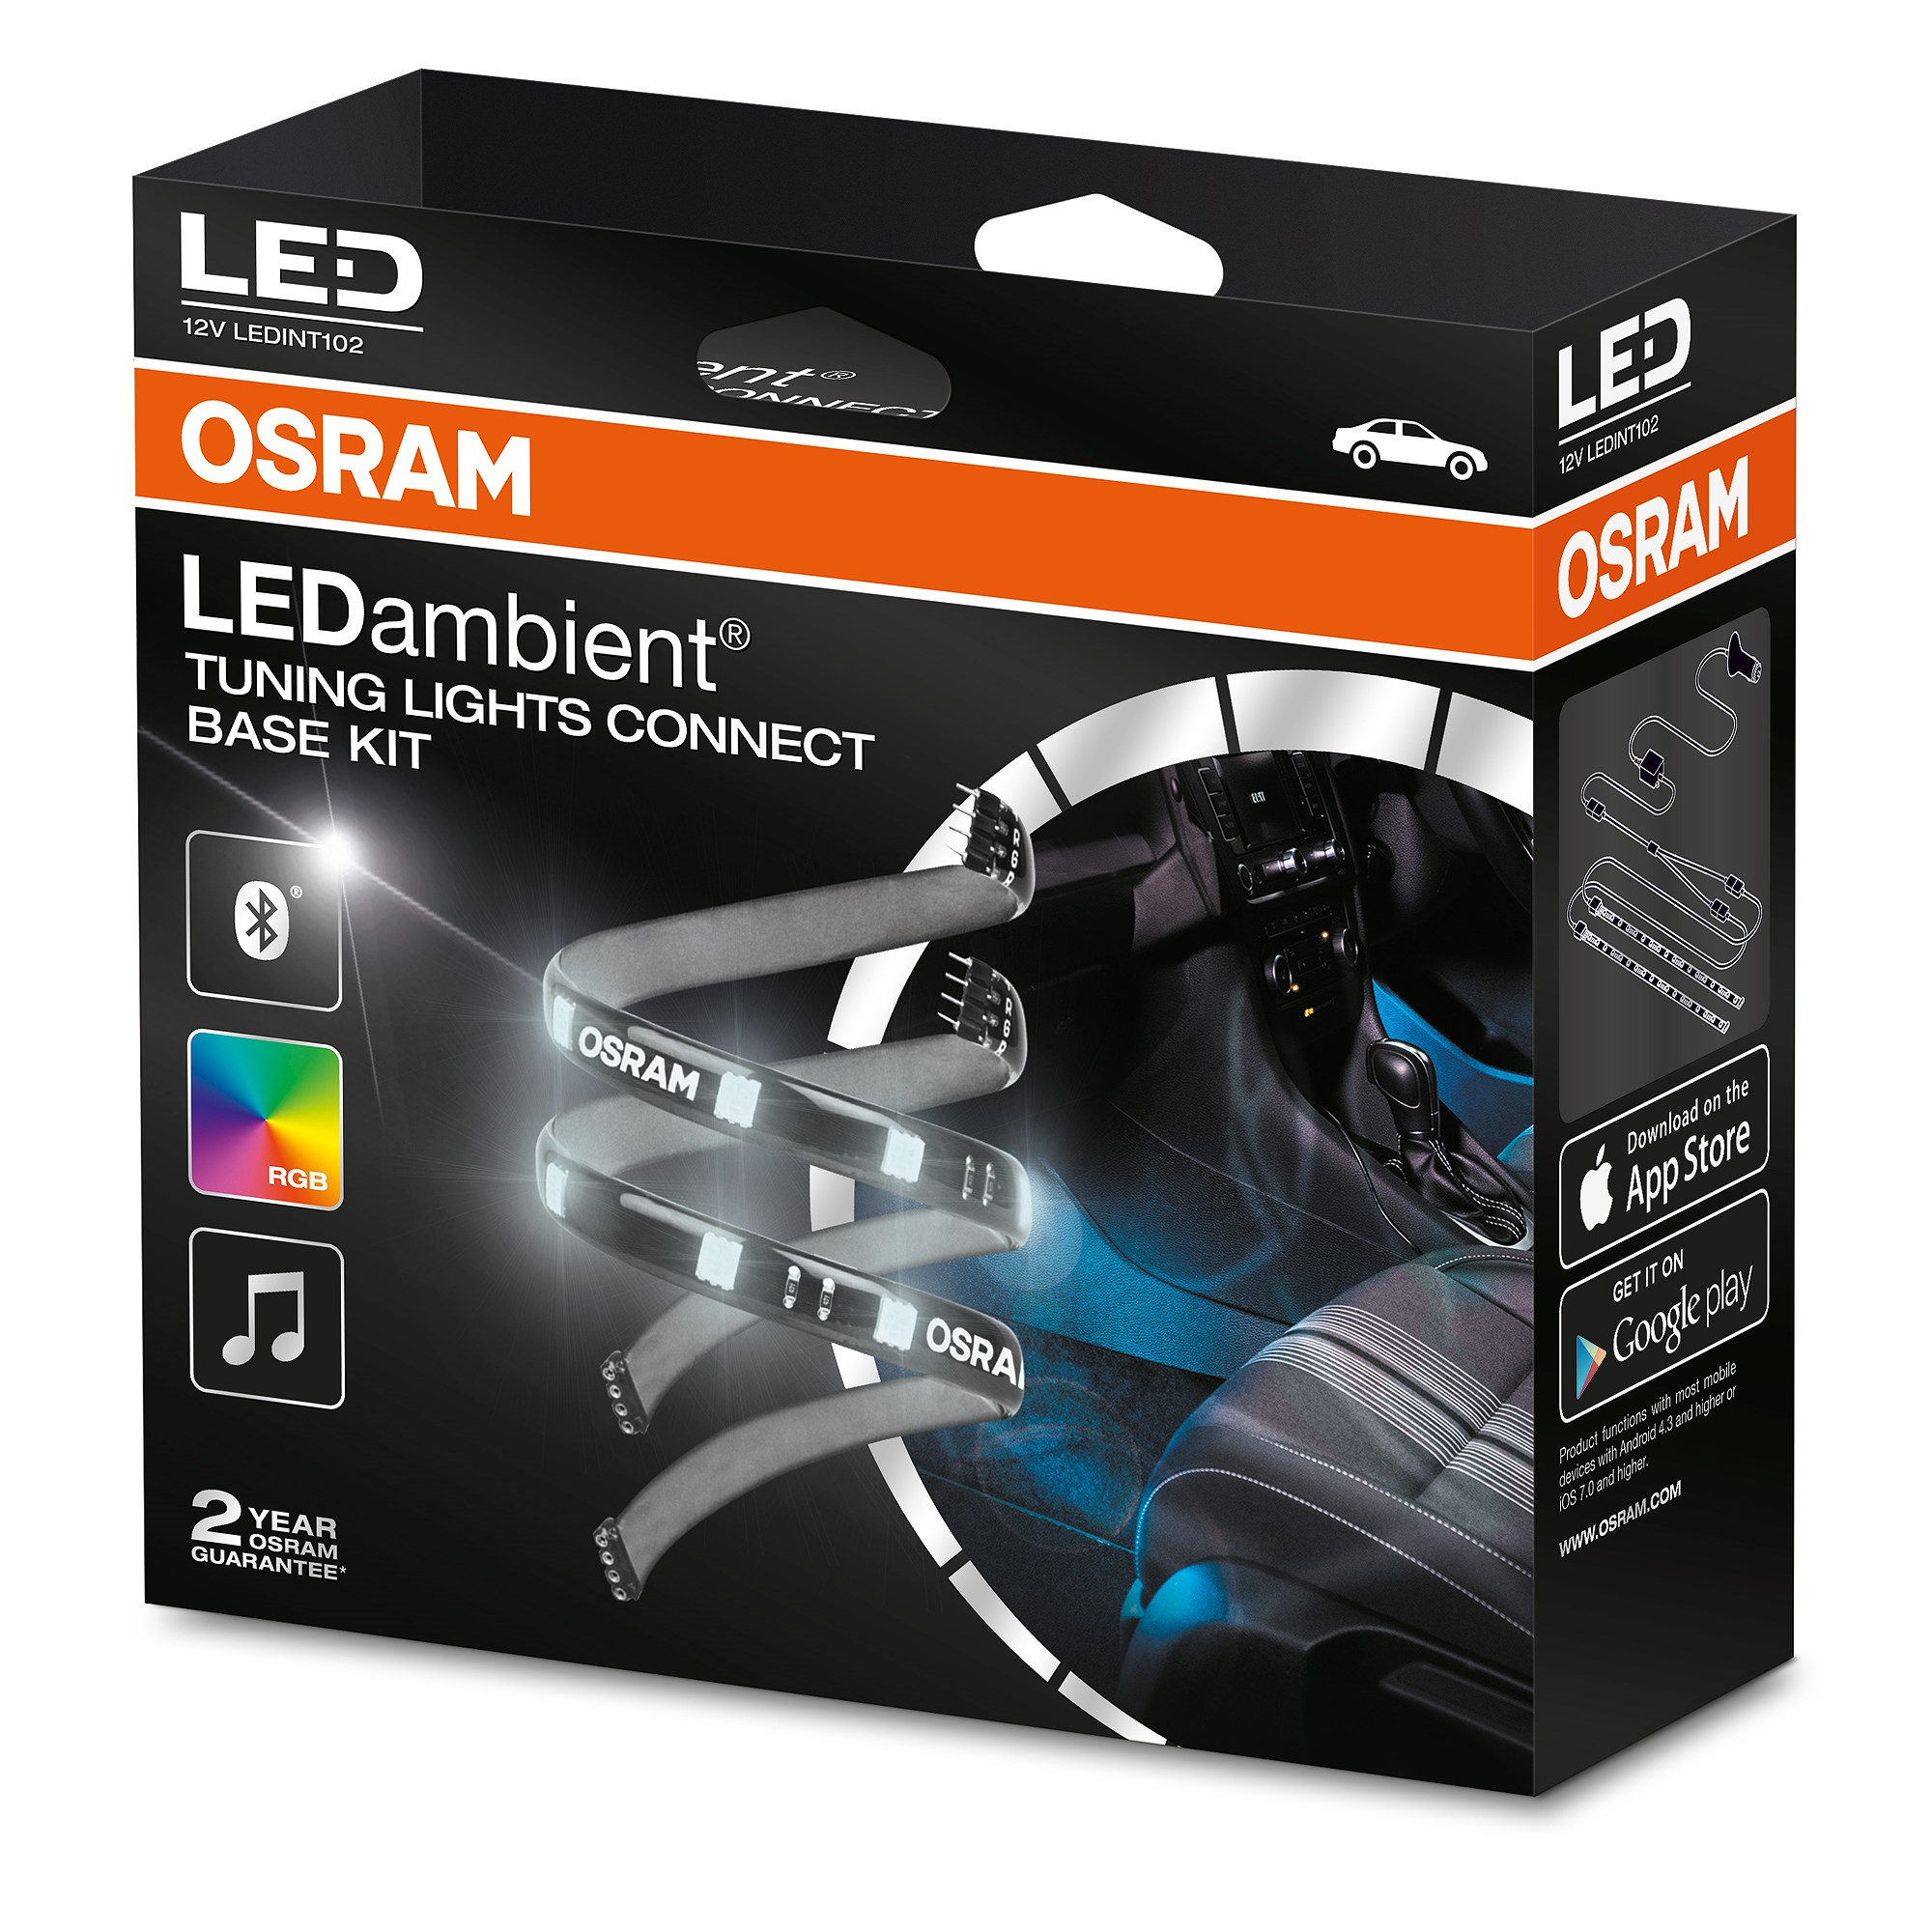 osram ledambient tuning lights connect. Black Bedroom Furniture Sets. Home Design Ideas